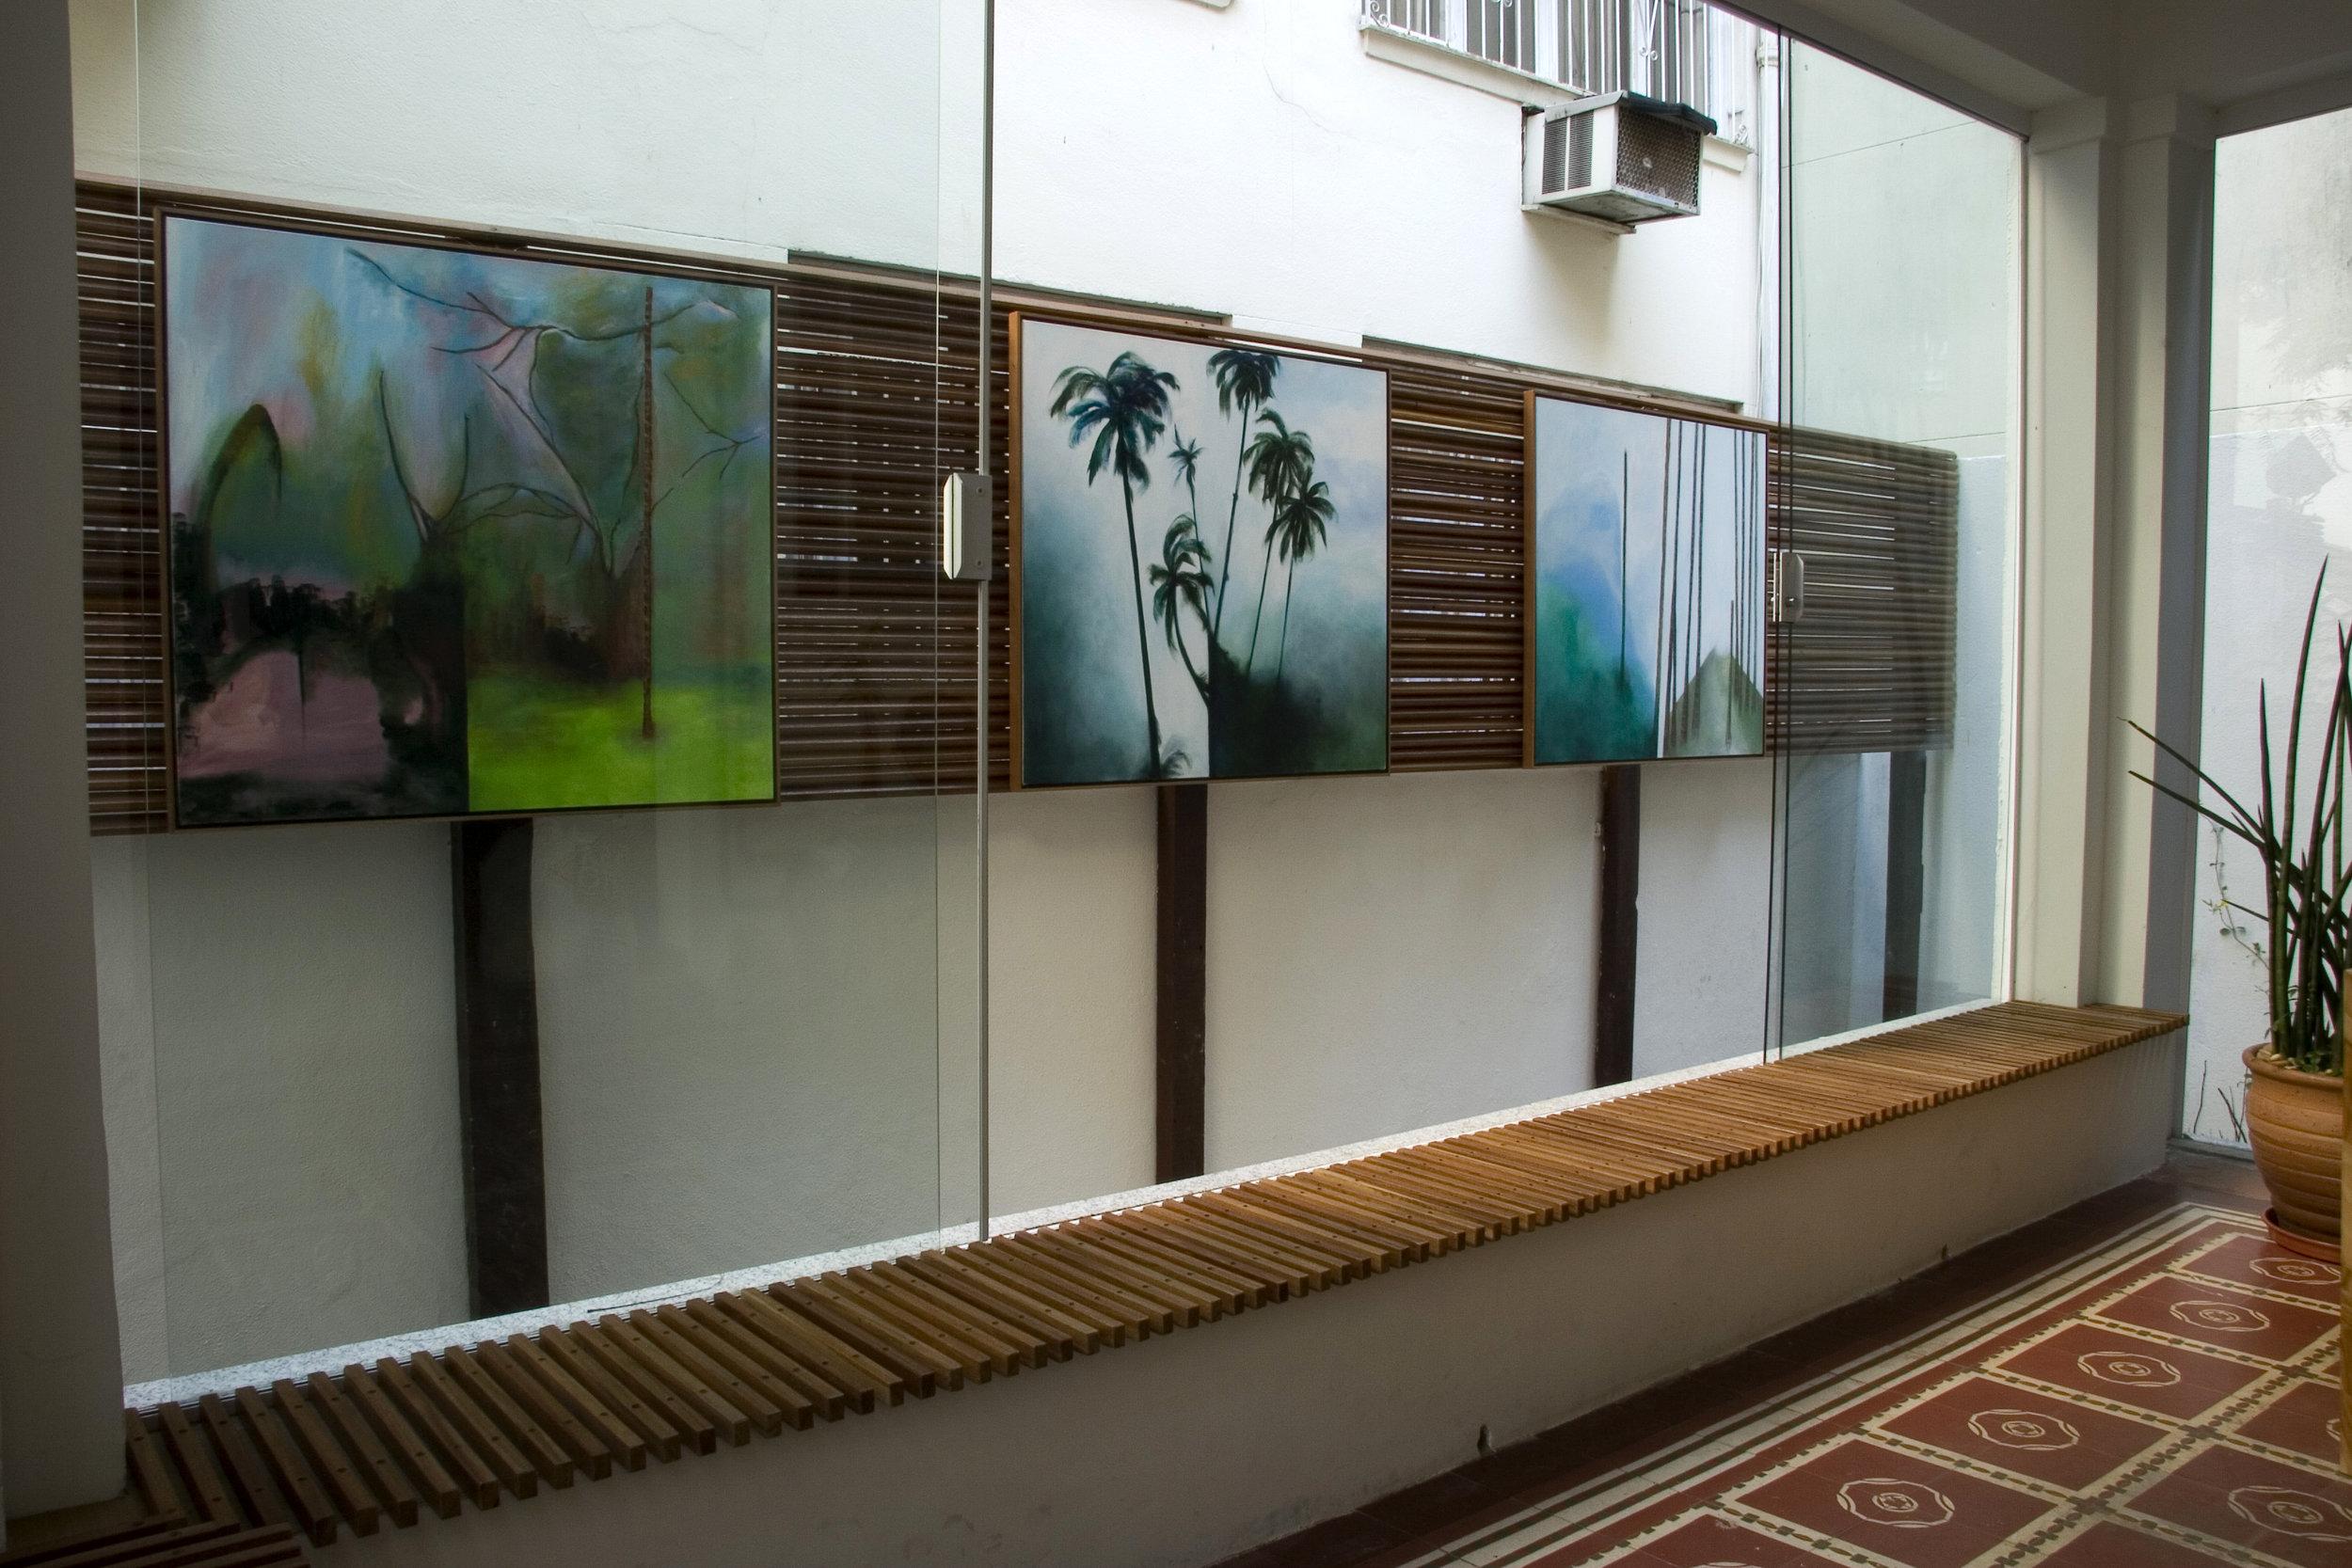 Fotos Expo Ana Rampa por Wilton Montenegro 016.jpg